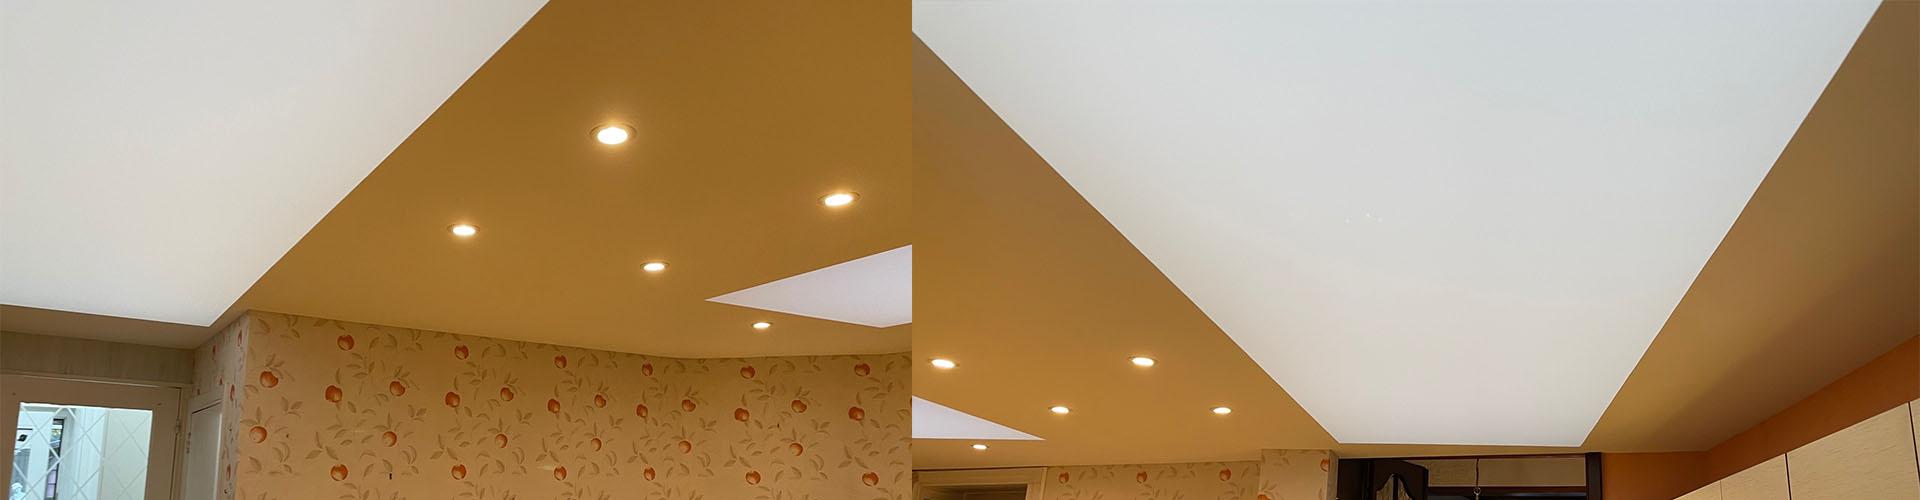 spanplafond05